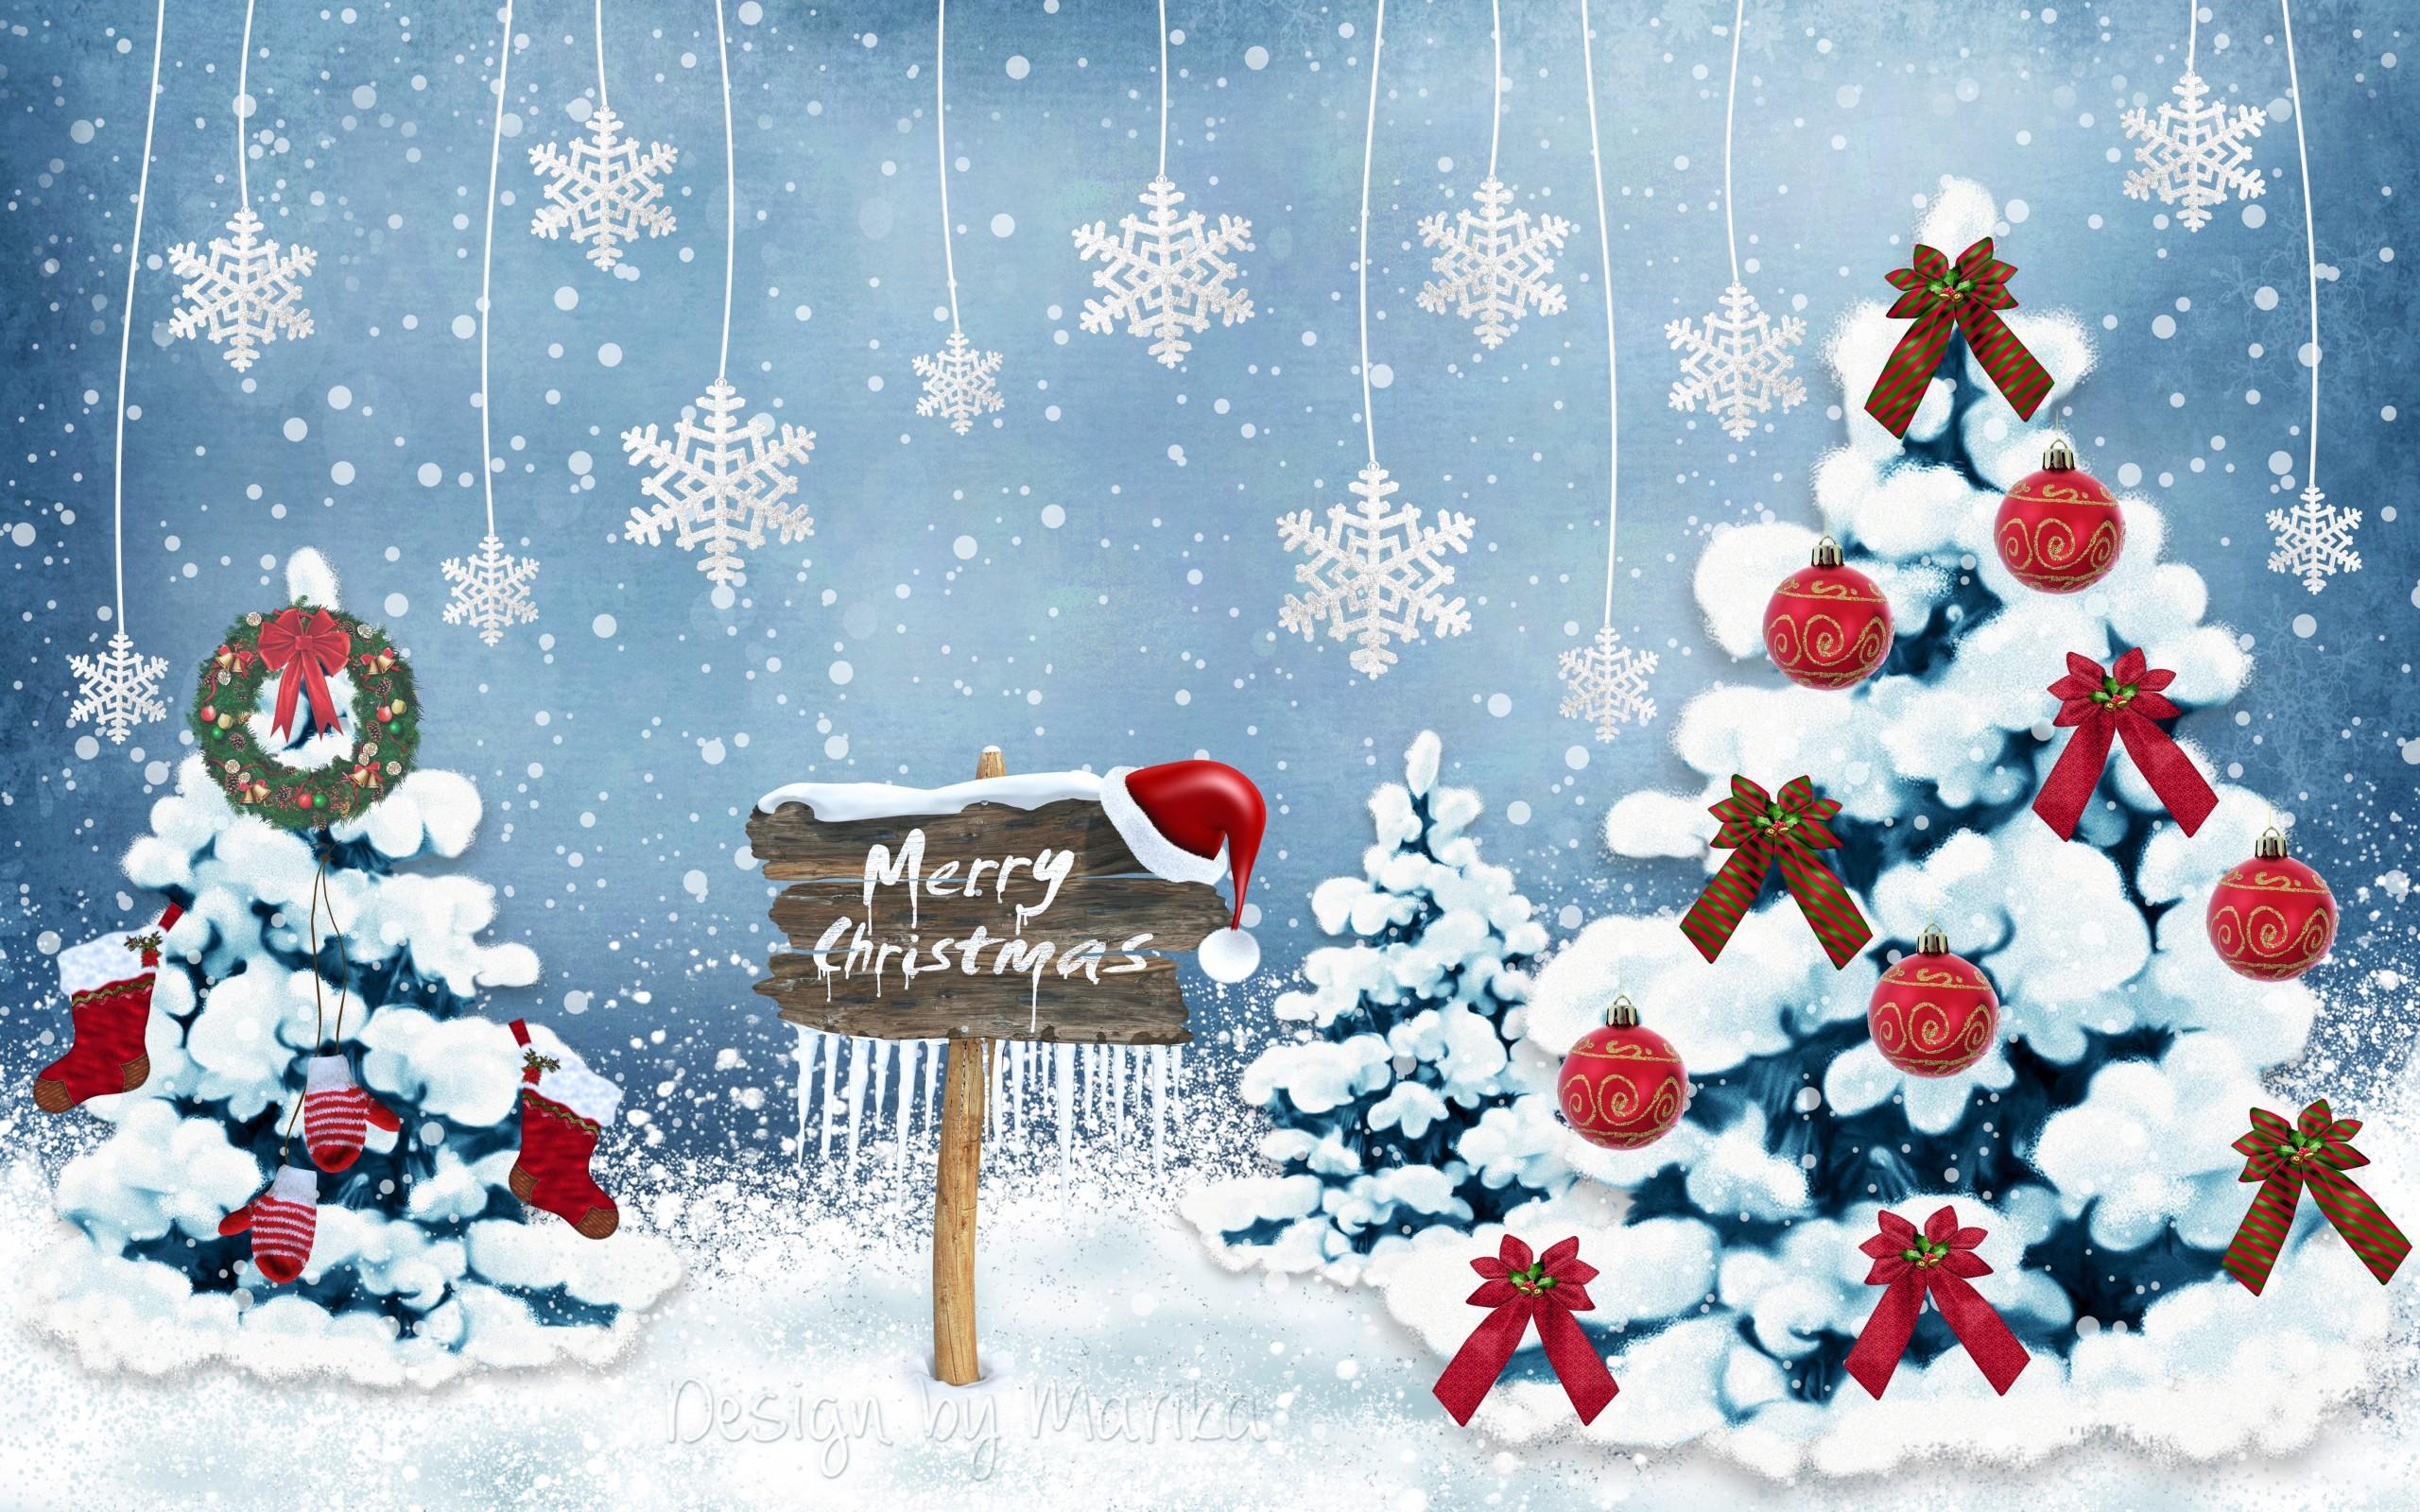 Merry Christmas 2016 HD Wallpaper 2560×1600